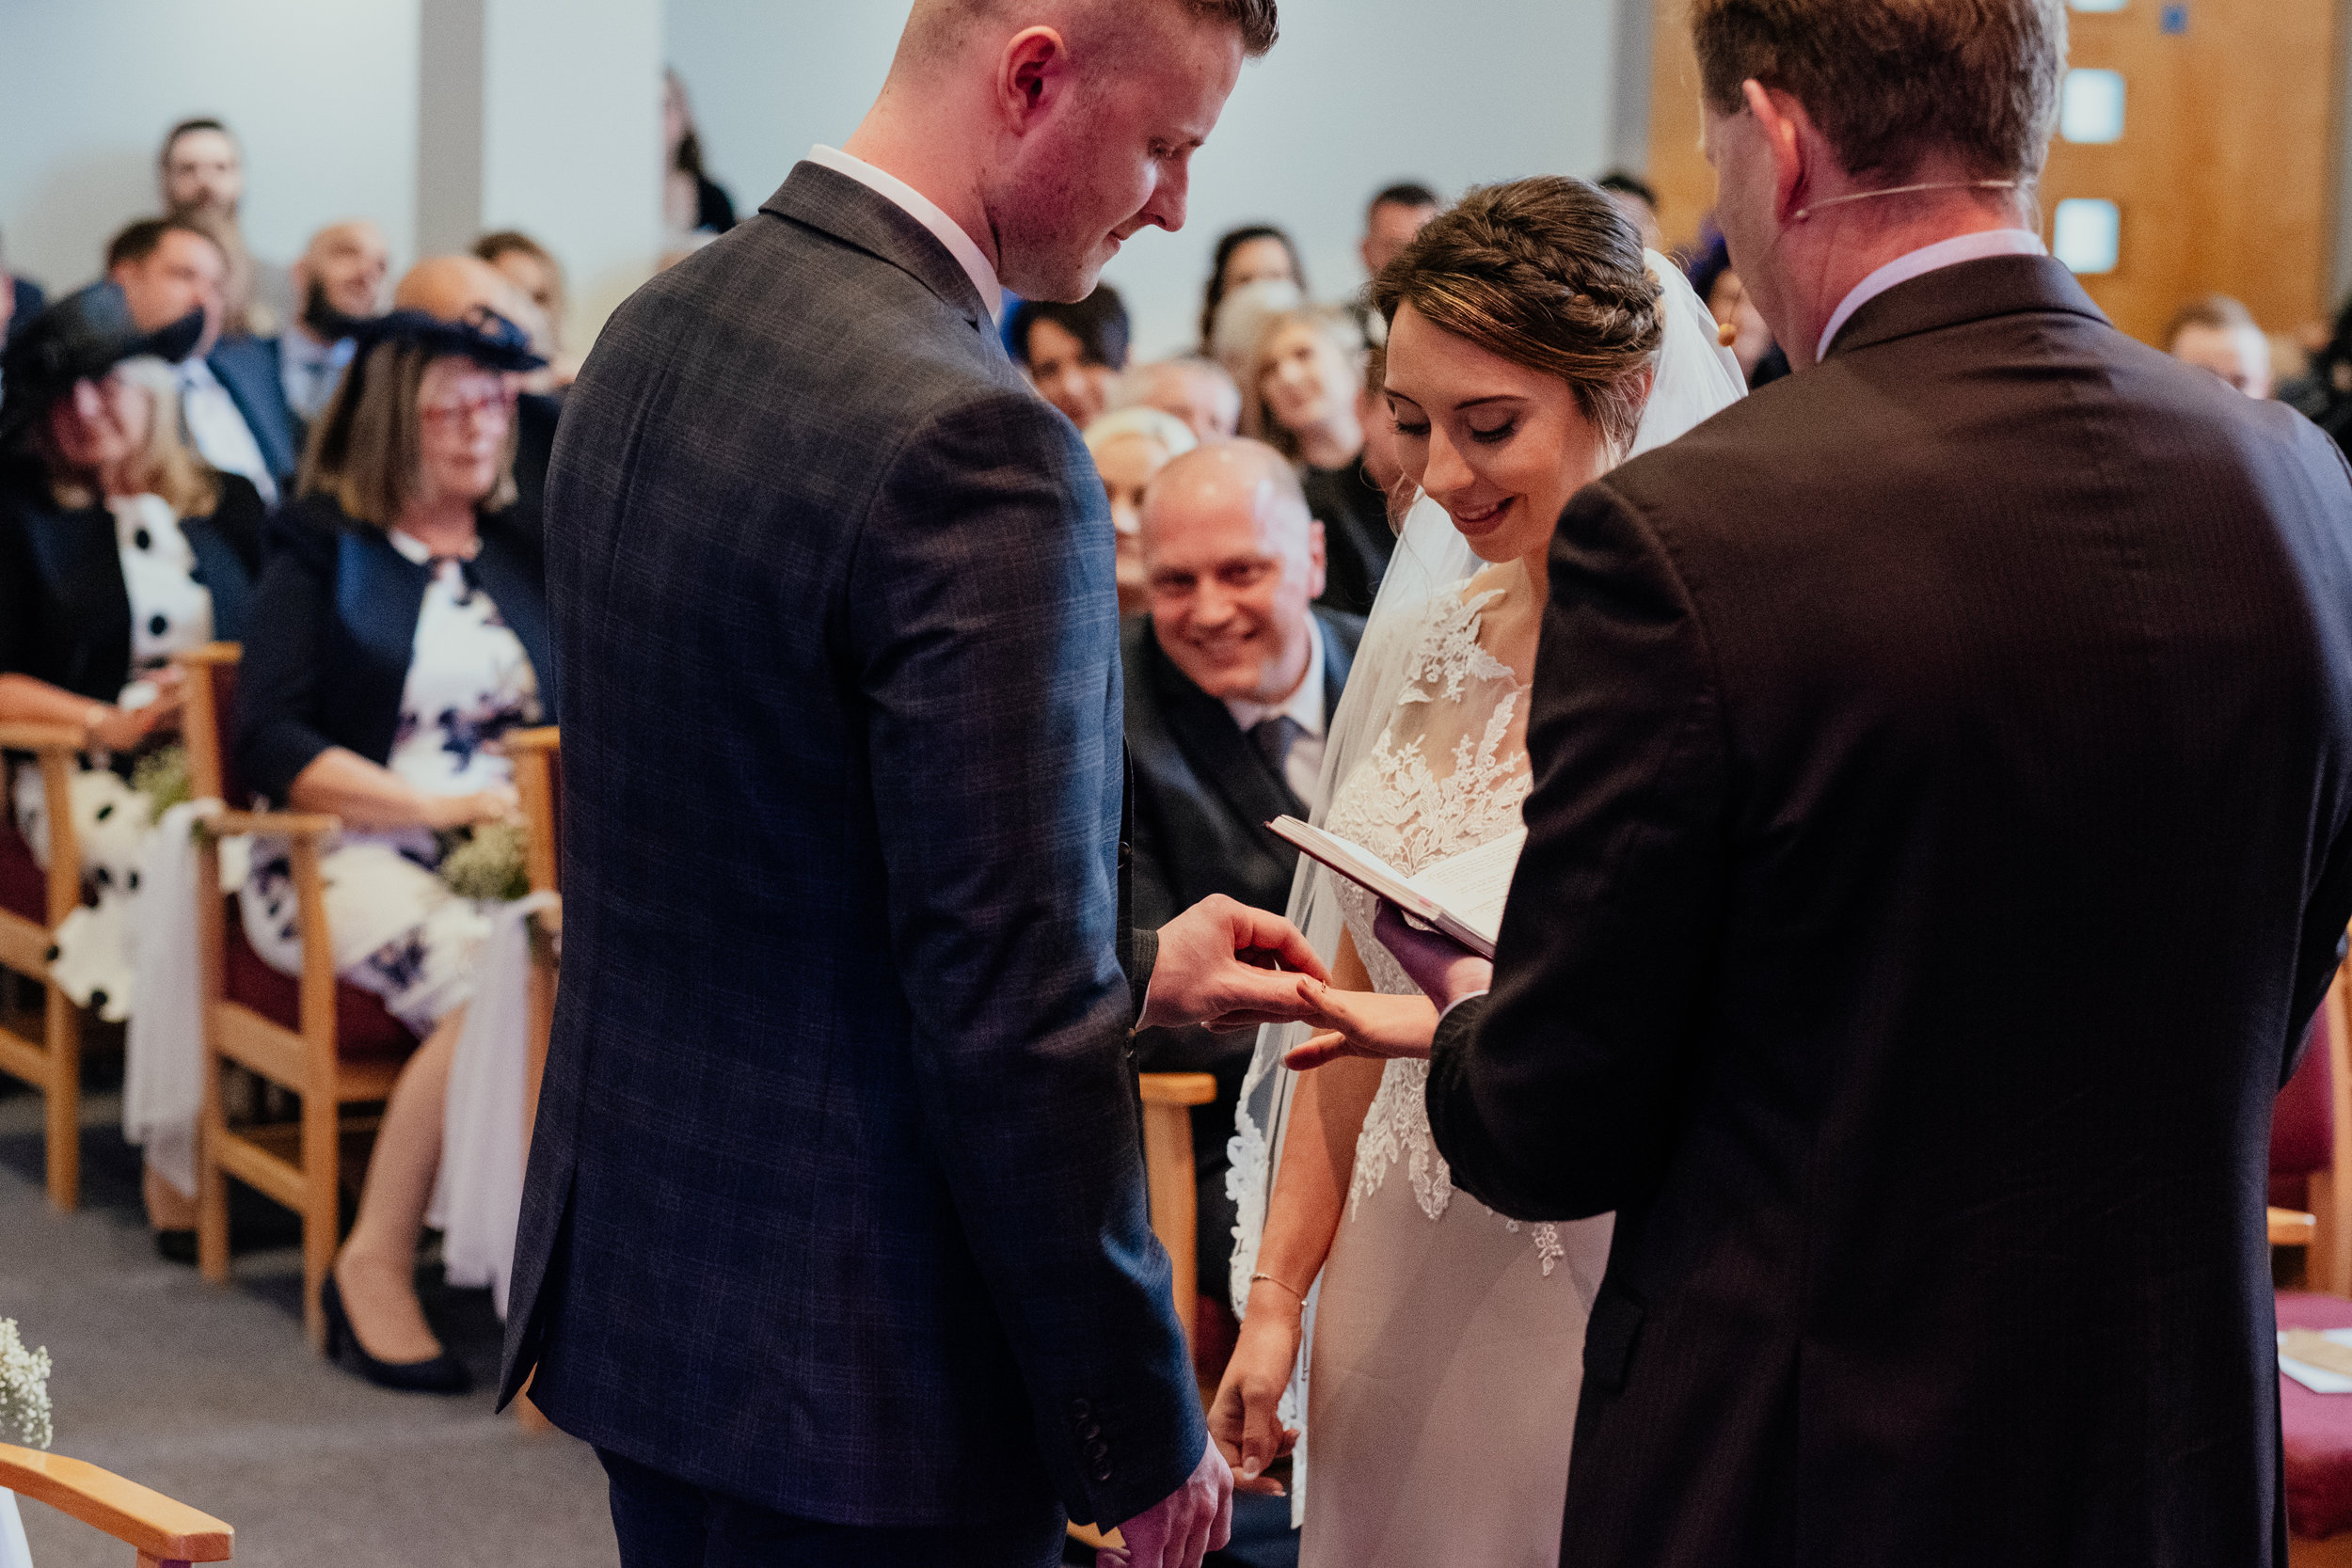 Groom puts rings on Bride's finger